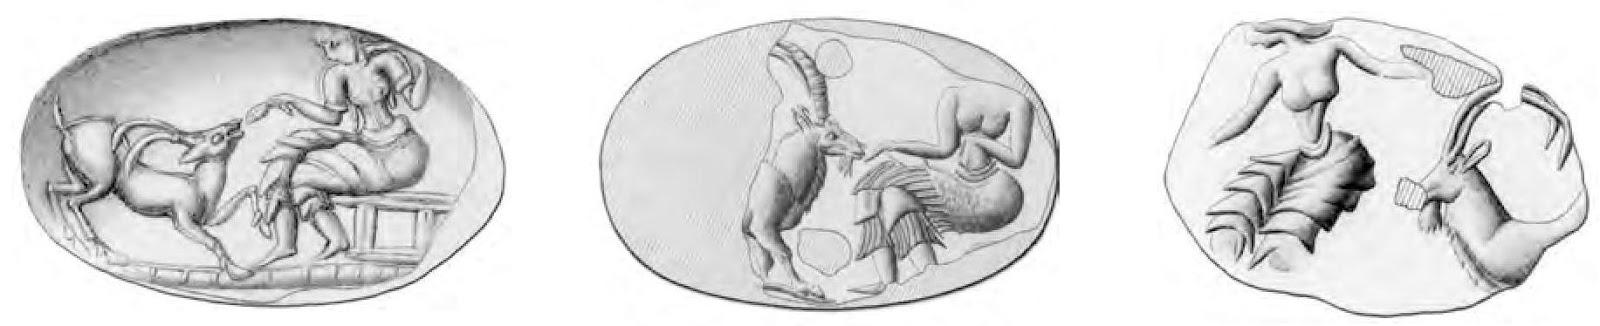 minoan ibex seals